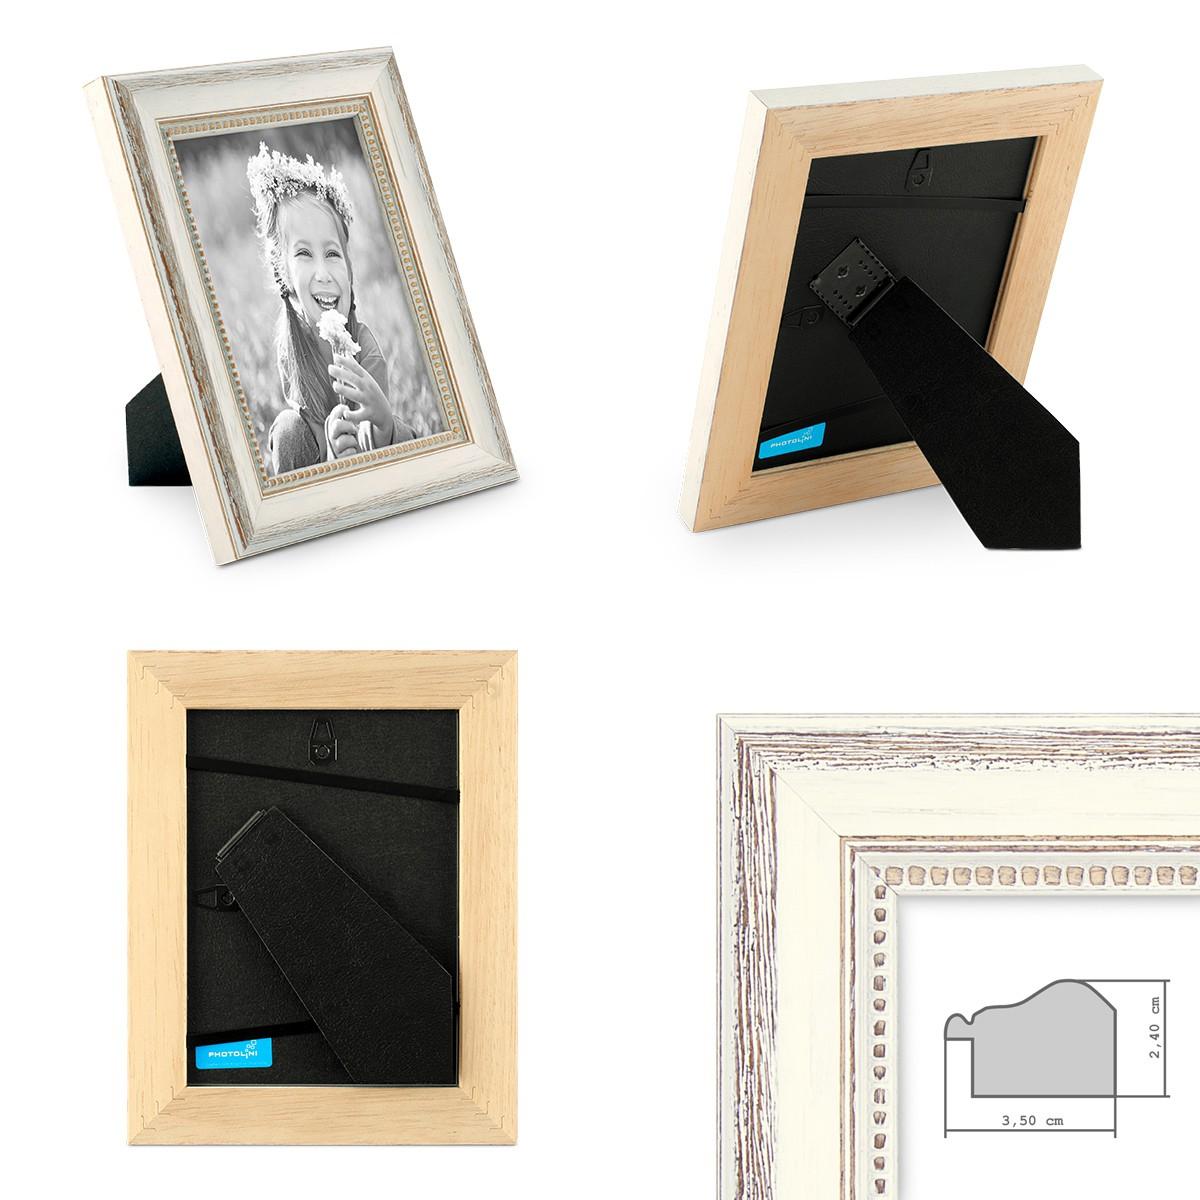 4er Set Bilderrahmen Shabby-Chic Landhaus-Stil Weiss 10x10 cm ...